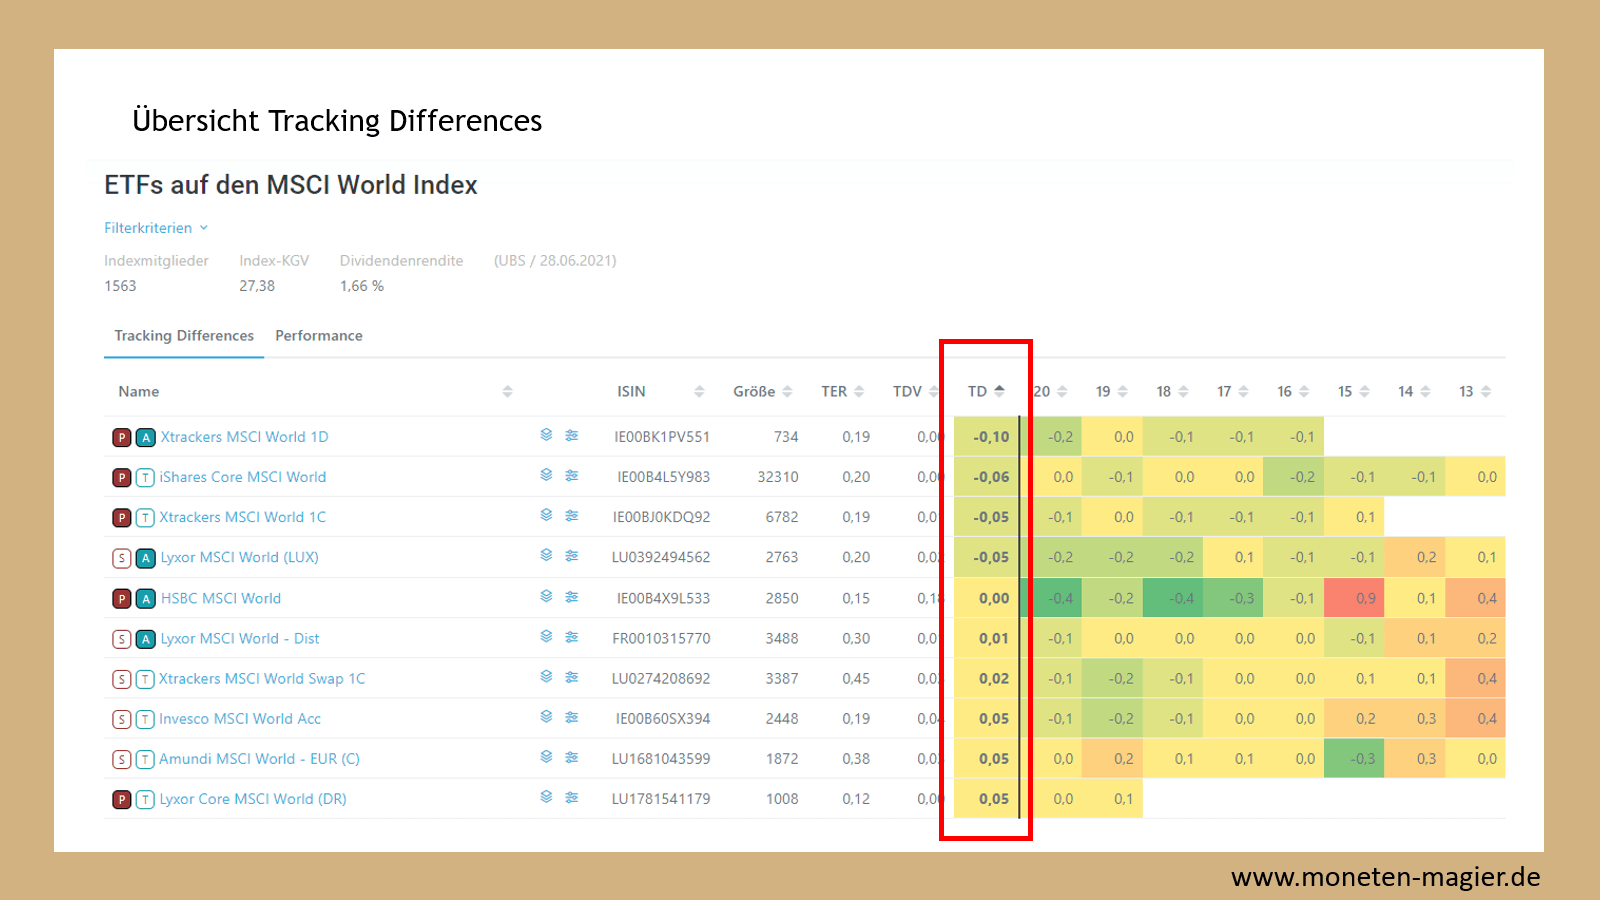 etf grundlagen tracking differences moneten magier